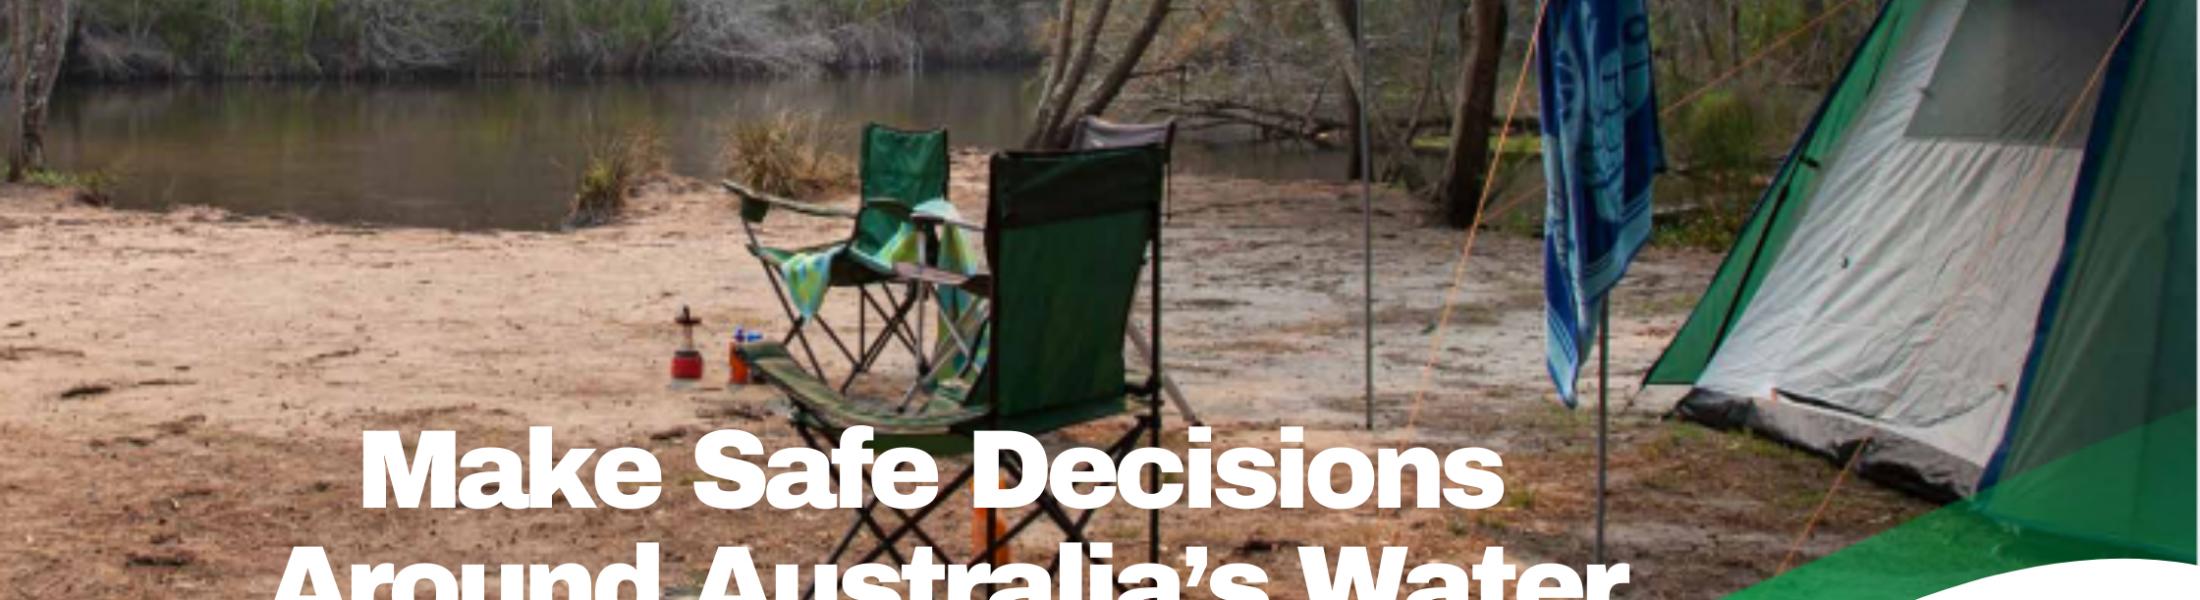 Make Safe Decisions Around Australian Water